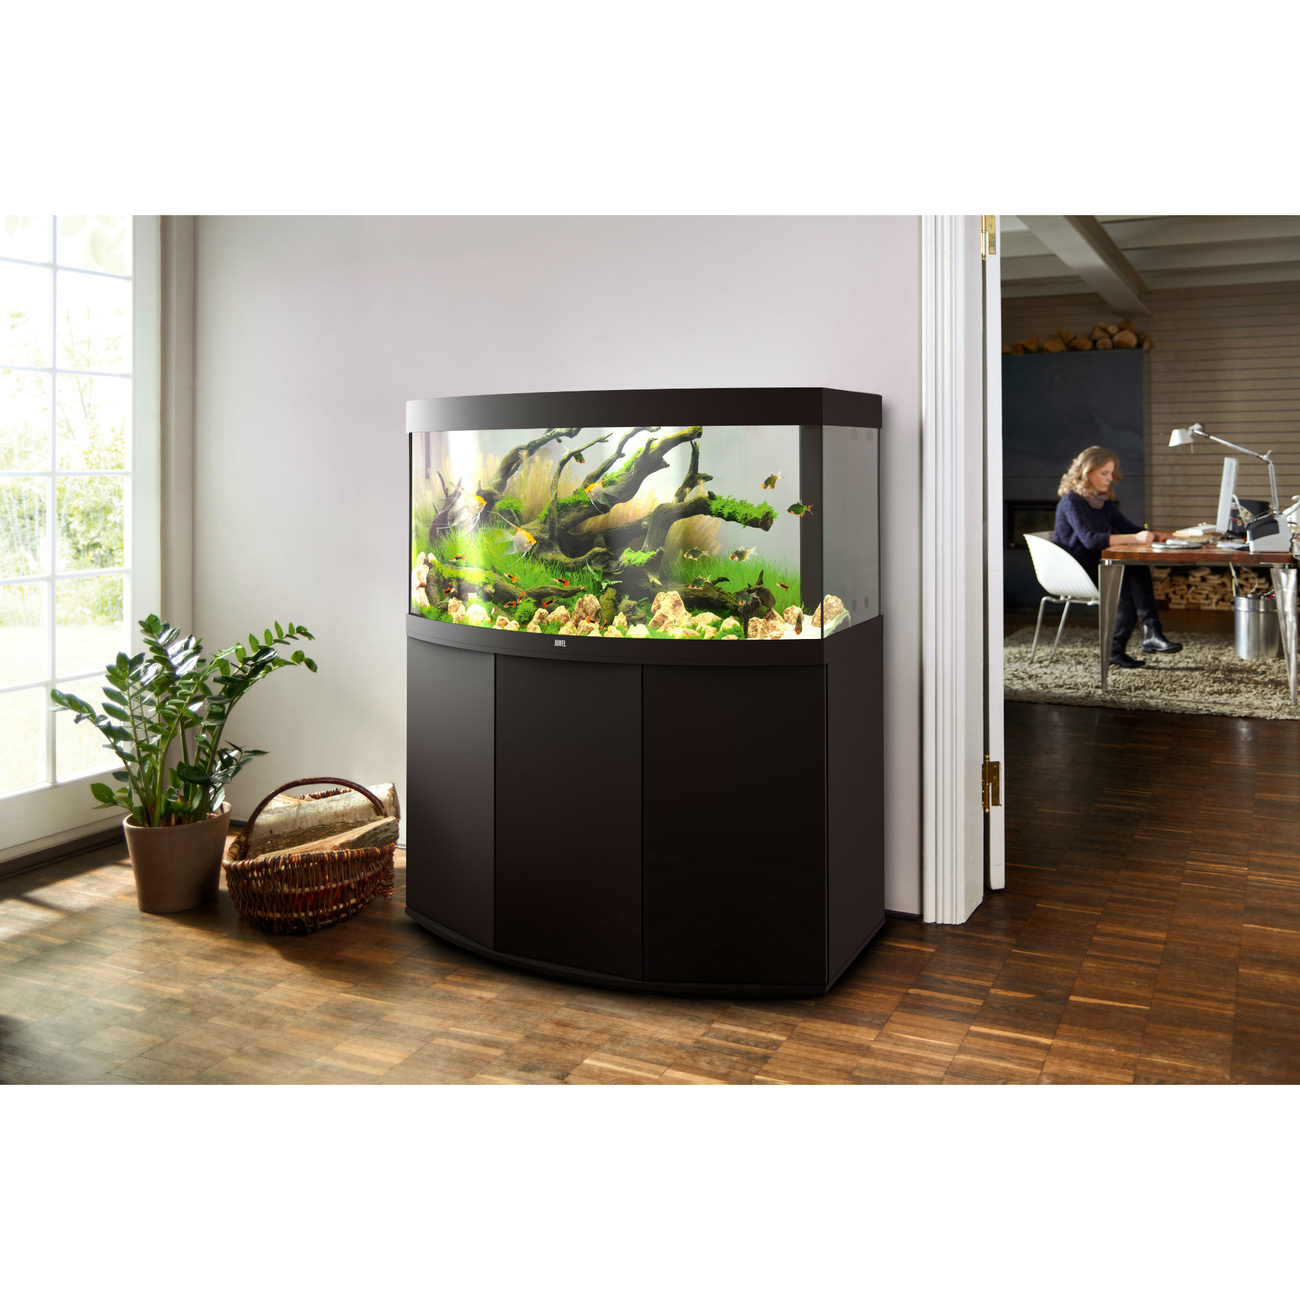 Juwel Vision 260 LED Aquarium mit Unterschrank SBX, Bild 4